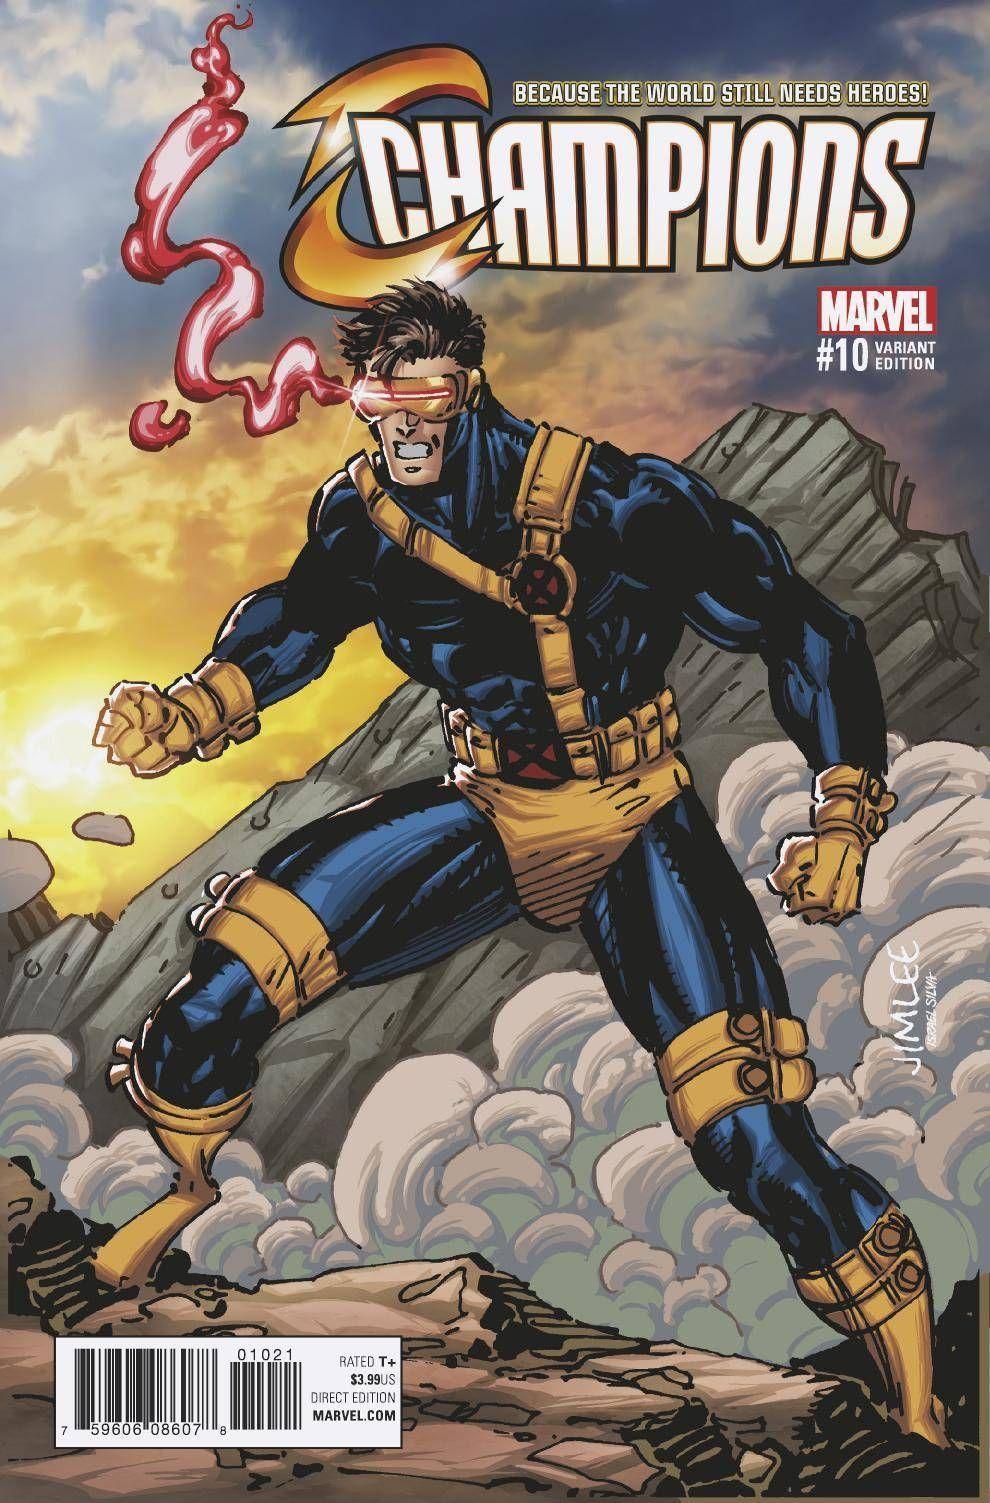 Champions 10 xmen card var Jim lee art, Comic art, Marvel